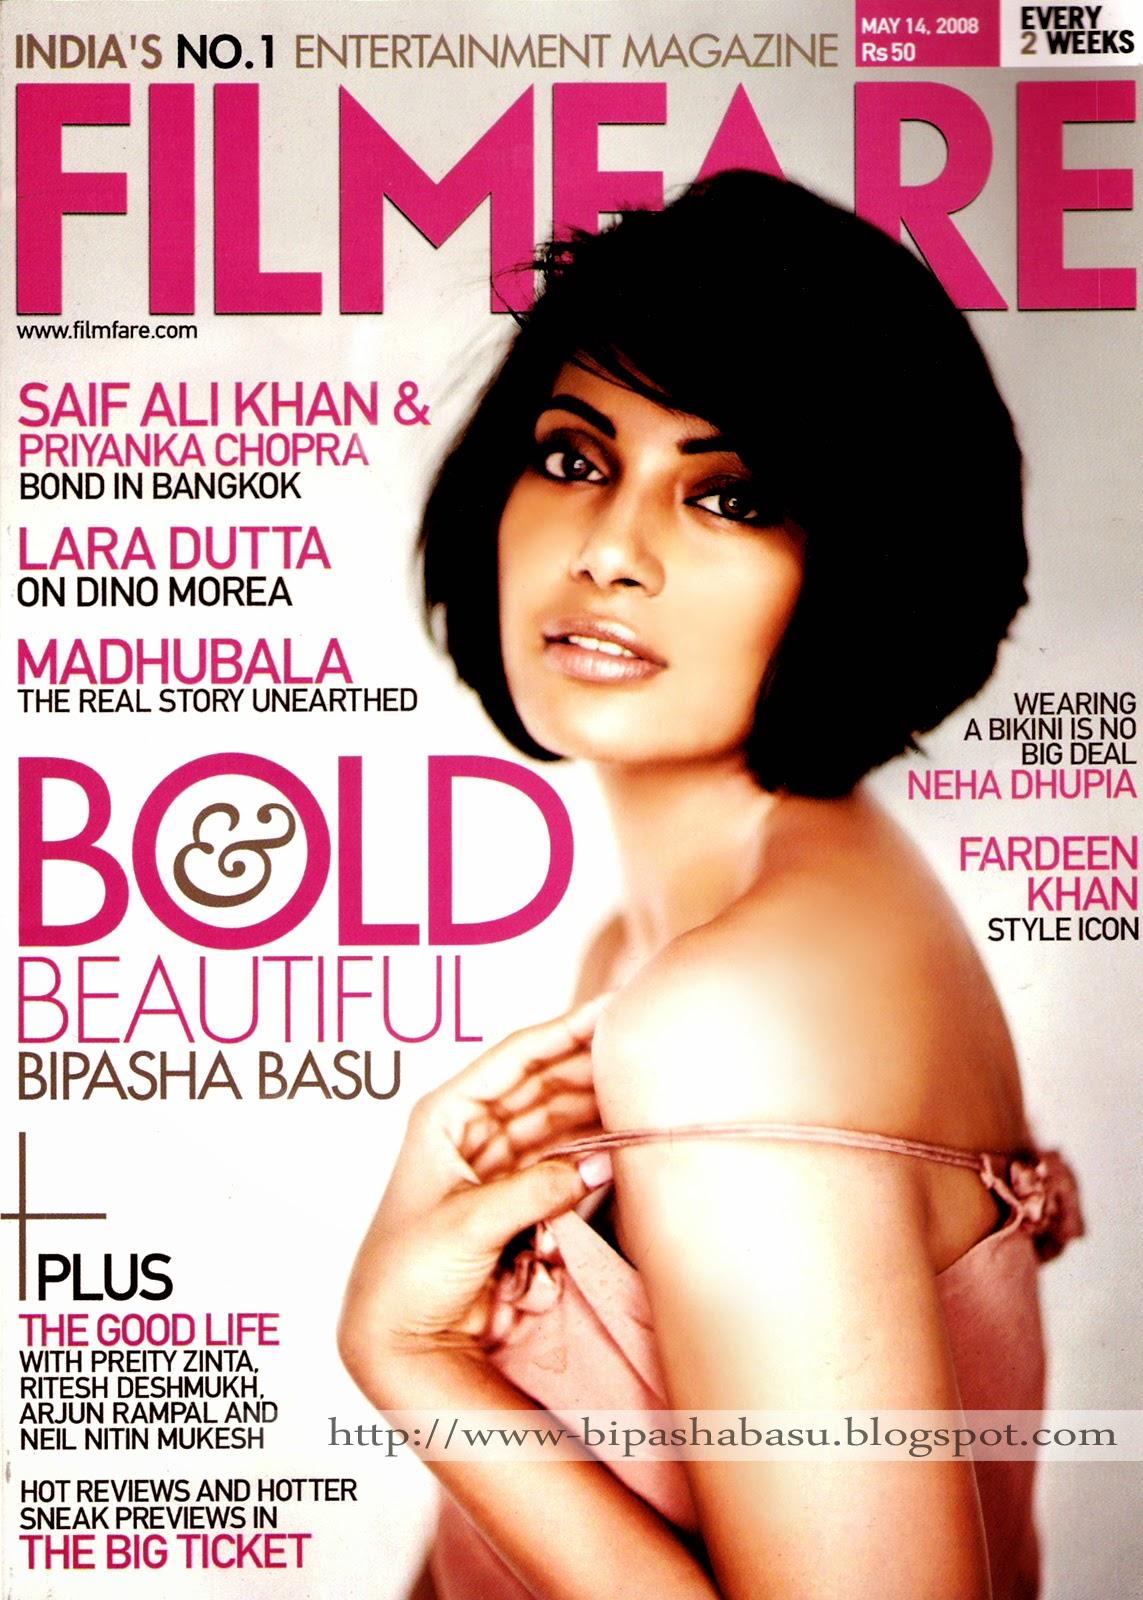 http://2.bp.blogspot.com/-rSmZIkpIHoI/U2oZJ3uQJ5I/AAAAAAAAcaQ/w__nmXkV34g/s1600/Filmfare-Magazine-Covers-Photo-Of-Bipasha-Basu-5.jpg